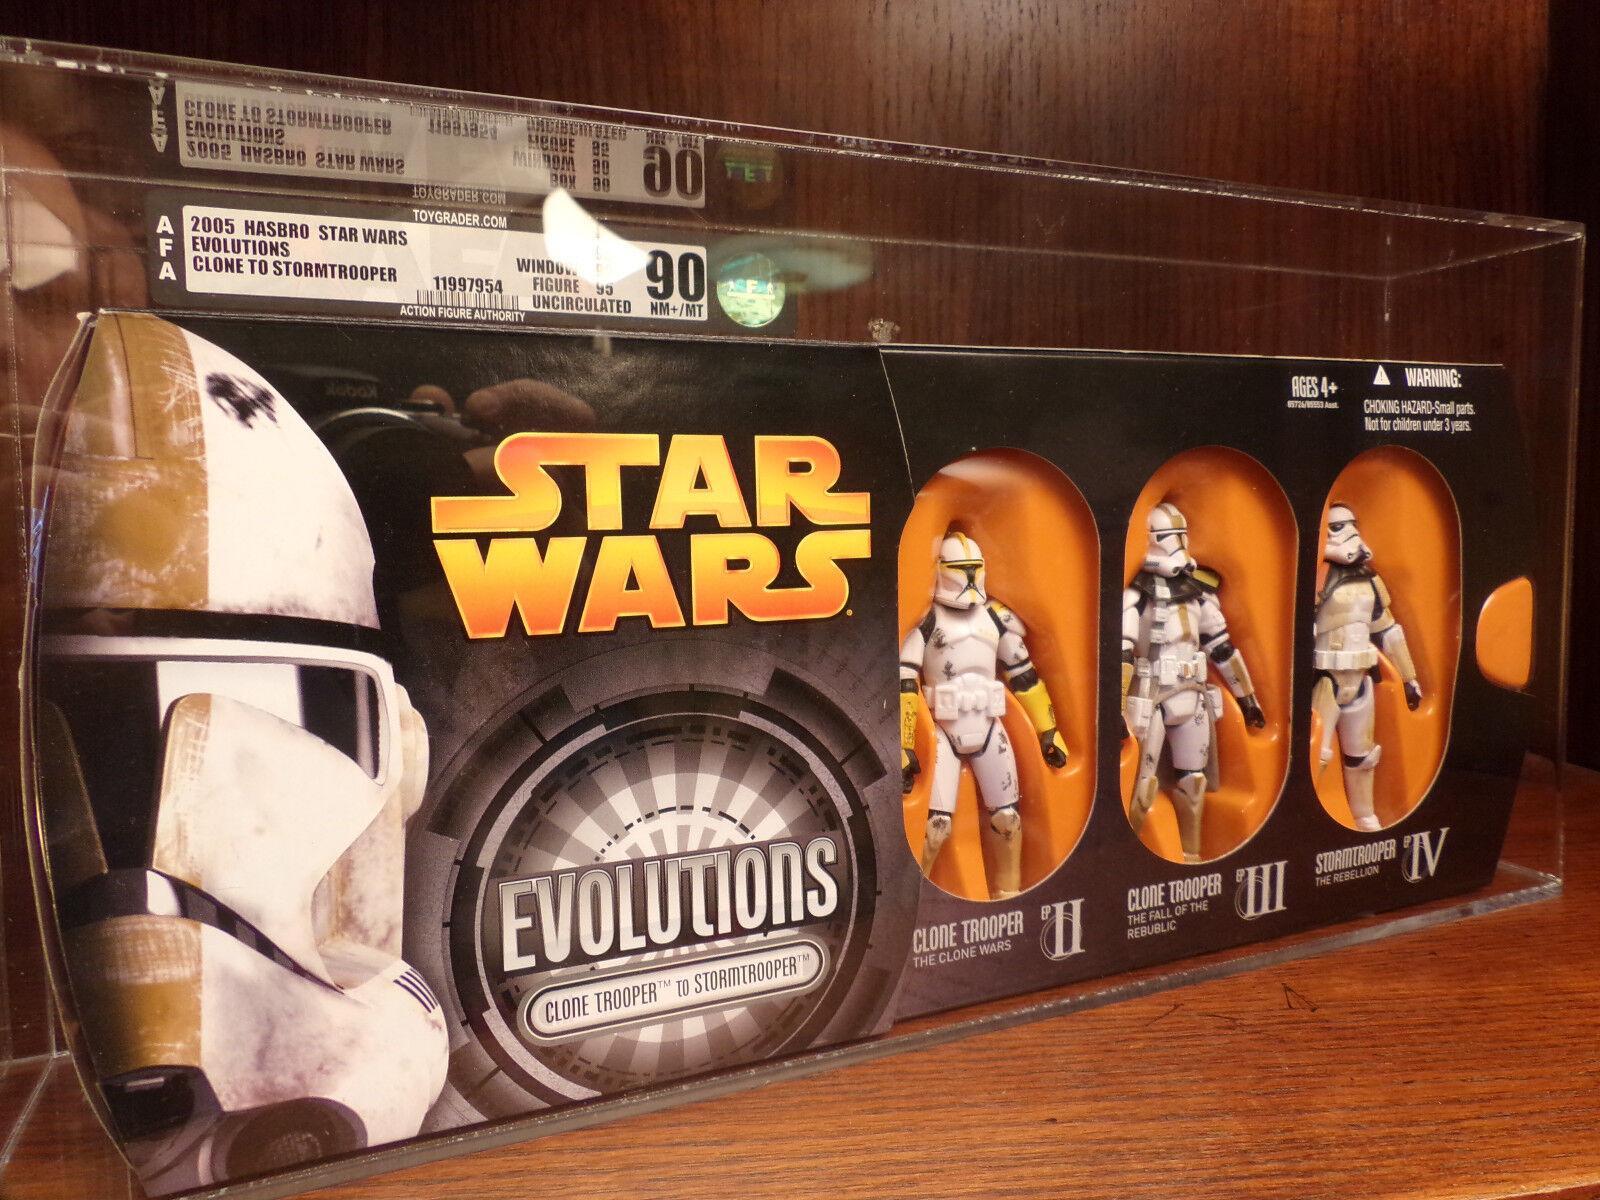 Star Star Star Wars Episode III Evolutions Clone Troopers Action Figure Set AFA U90 b08d7a